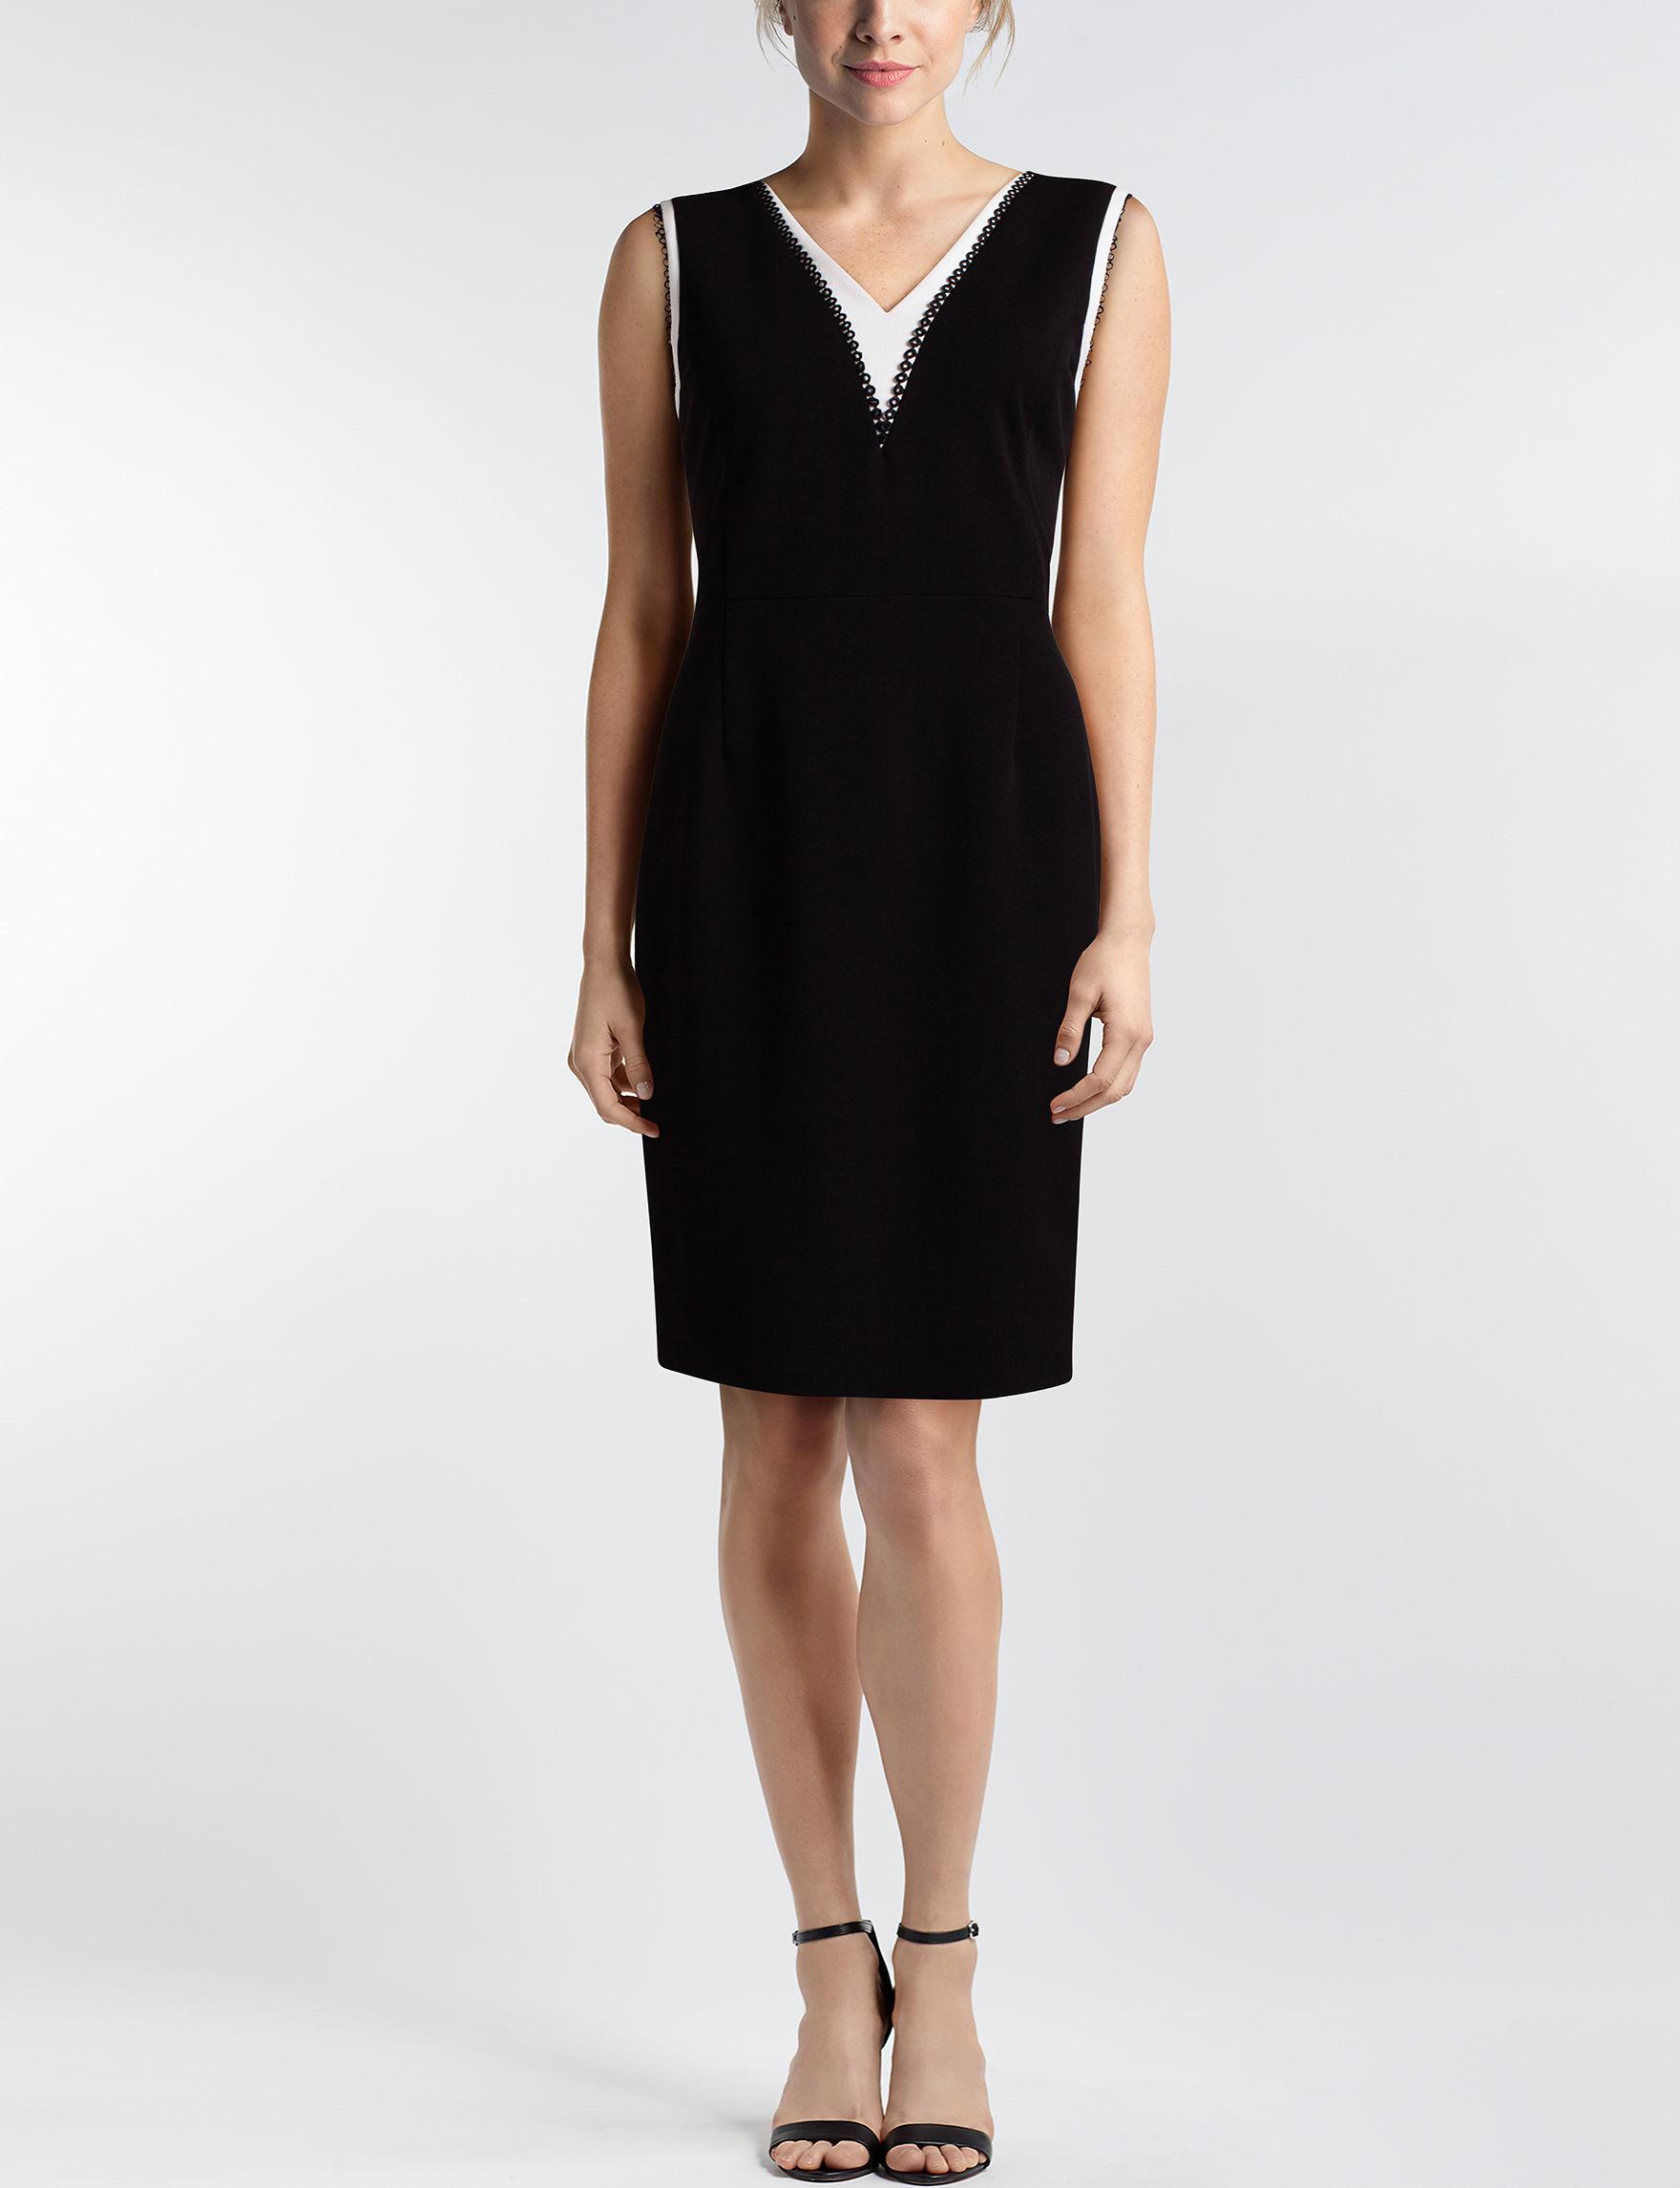 JM Studio Black Everyday & Casual Sheath Dresses